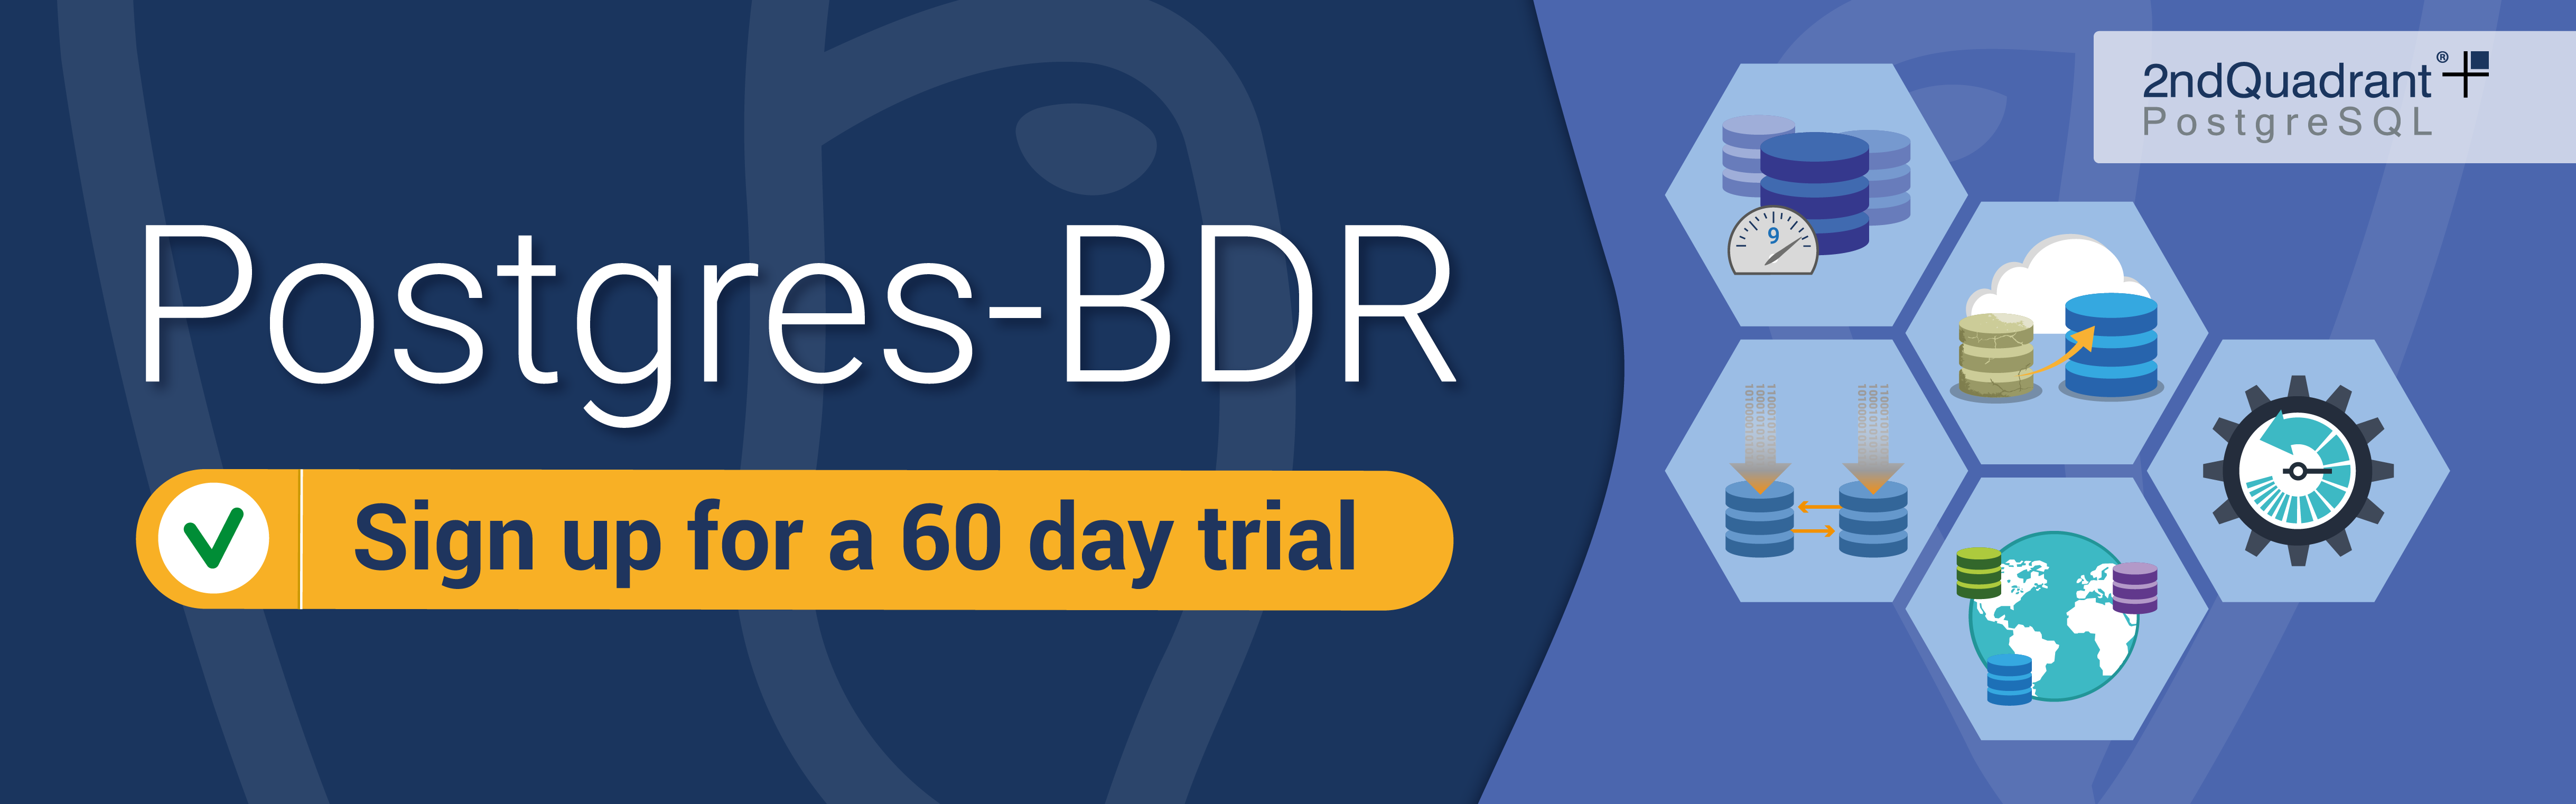 postgres-bdr trial, postgresql postgres-bdr trial 2ndquadrant